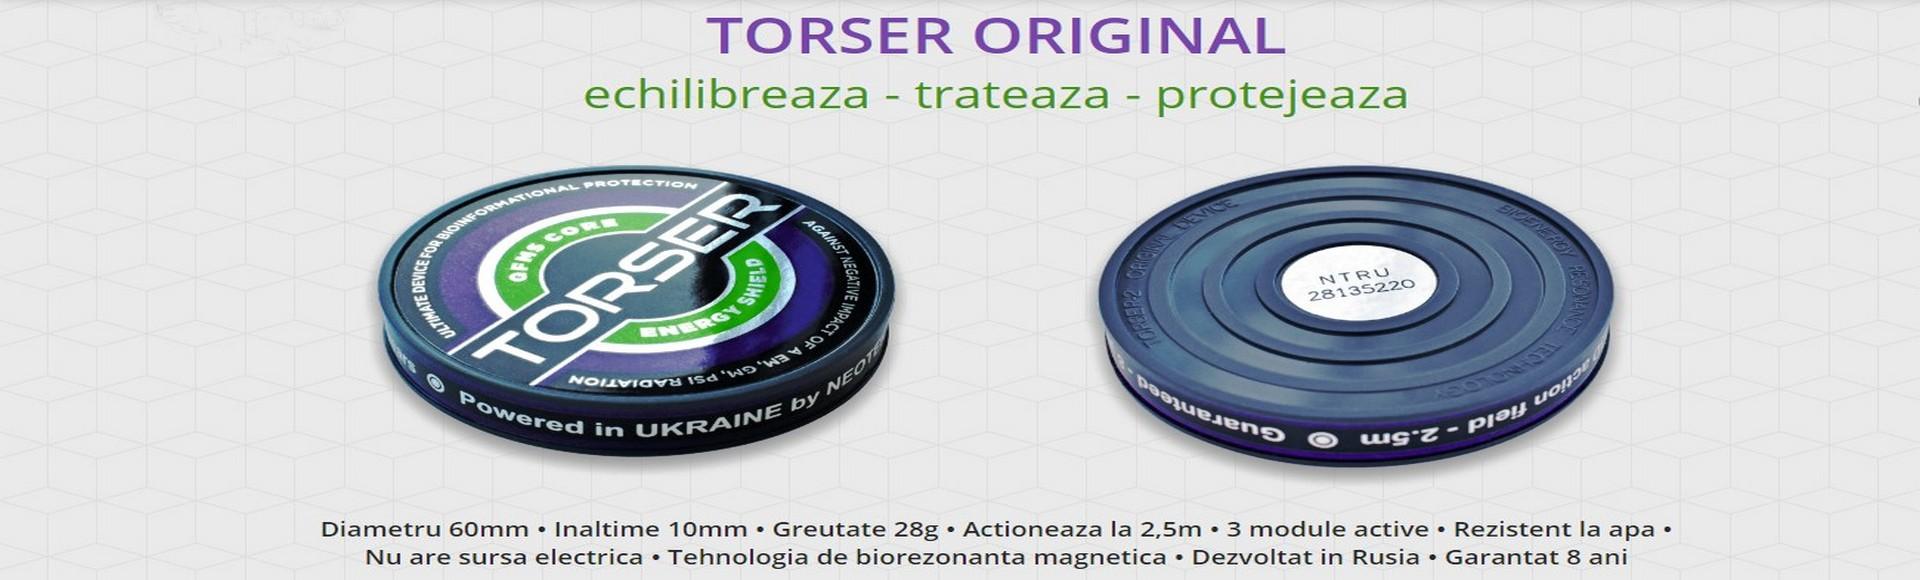 TORSER Original - Tehnologia de biorezonanta magnetica